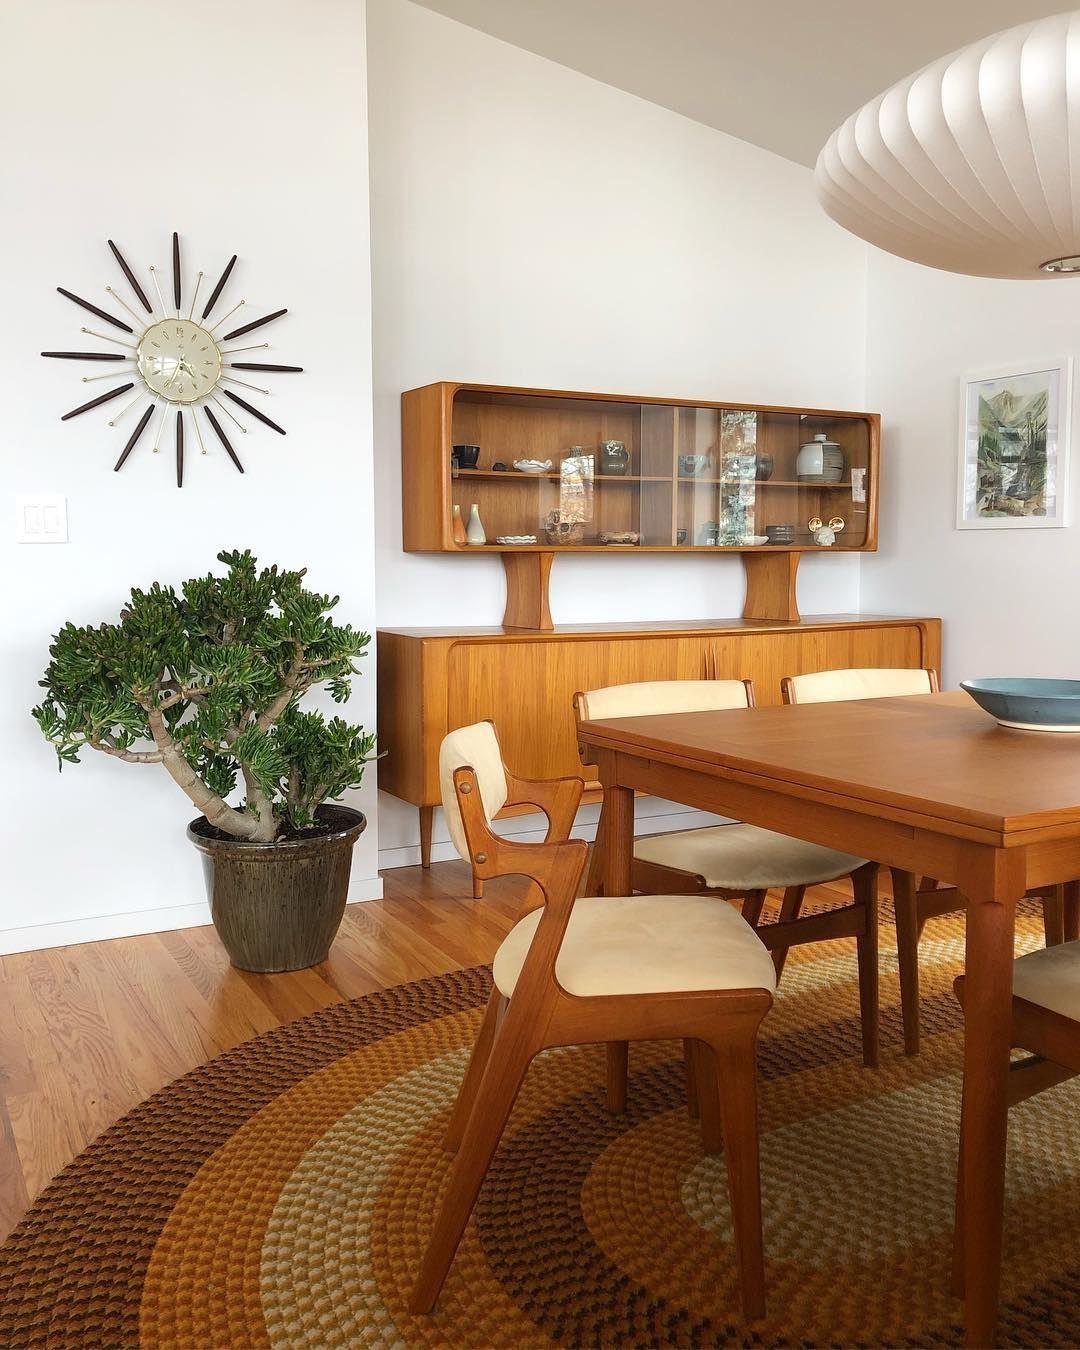 41 Beautiful Mid Century Home Decor Ideas | Mid century ...